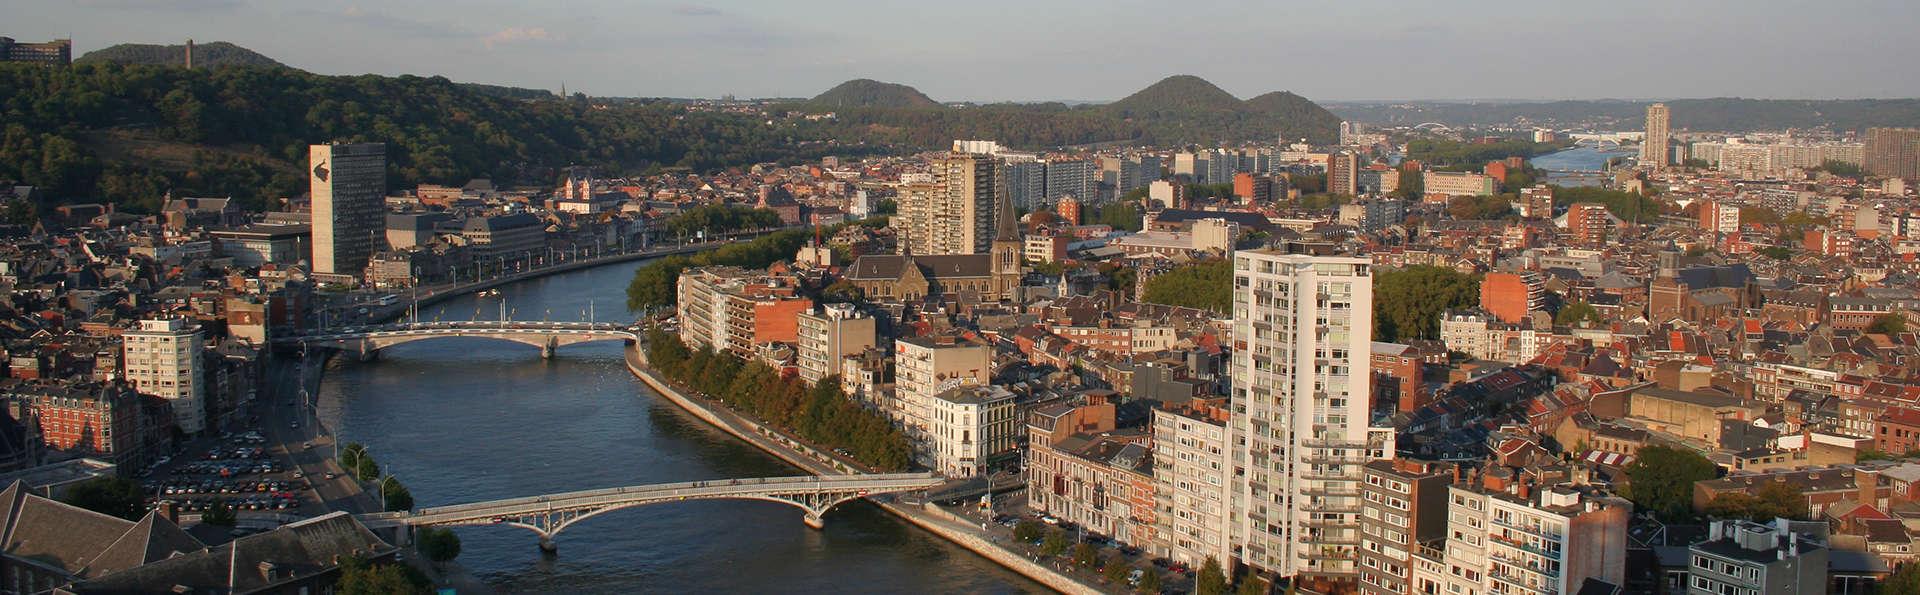 Hôtel Selys Liège  - EDIT_destination.jpg